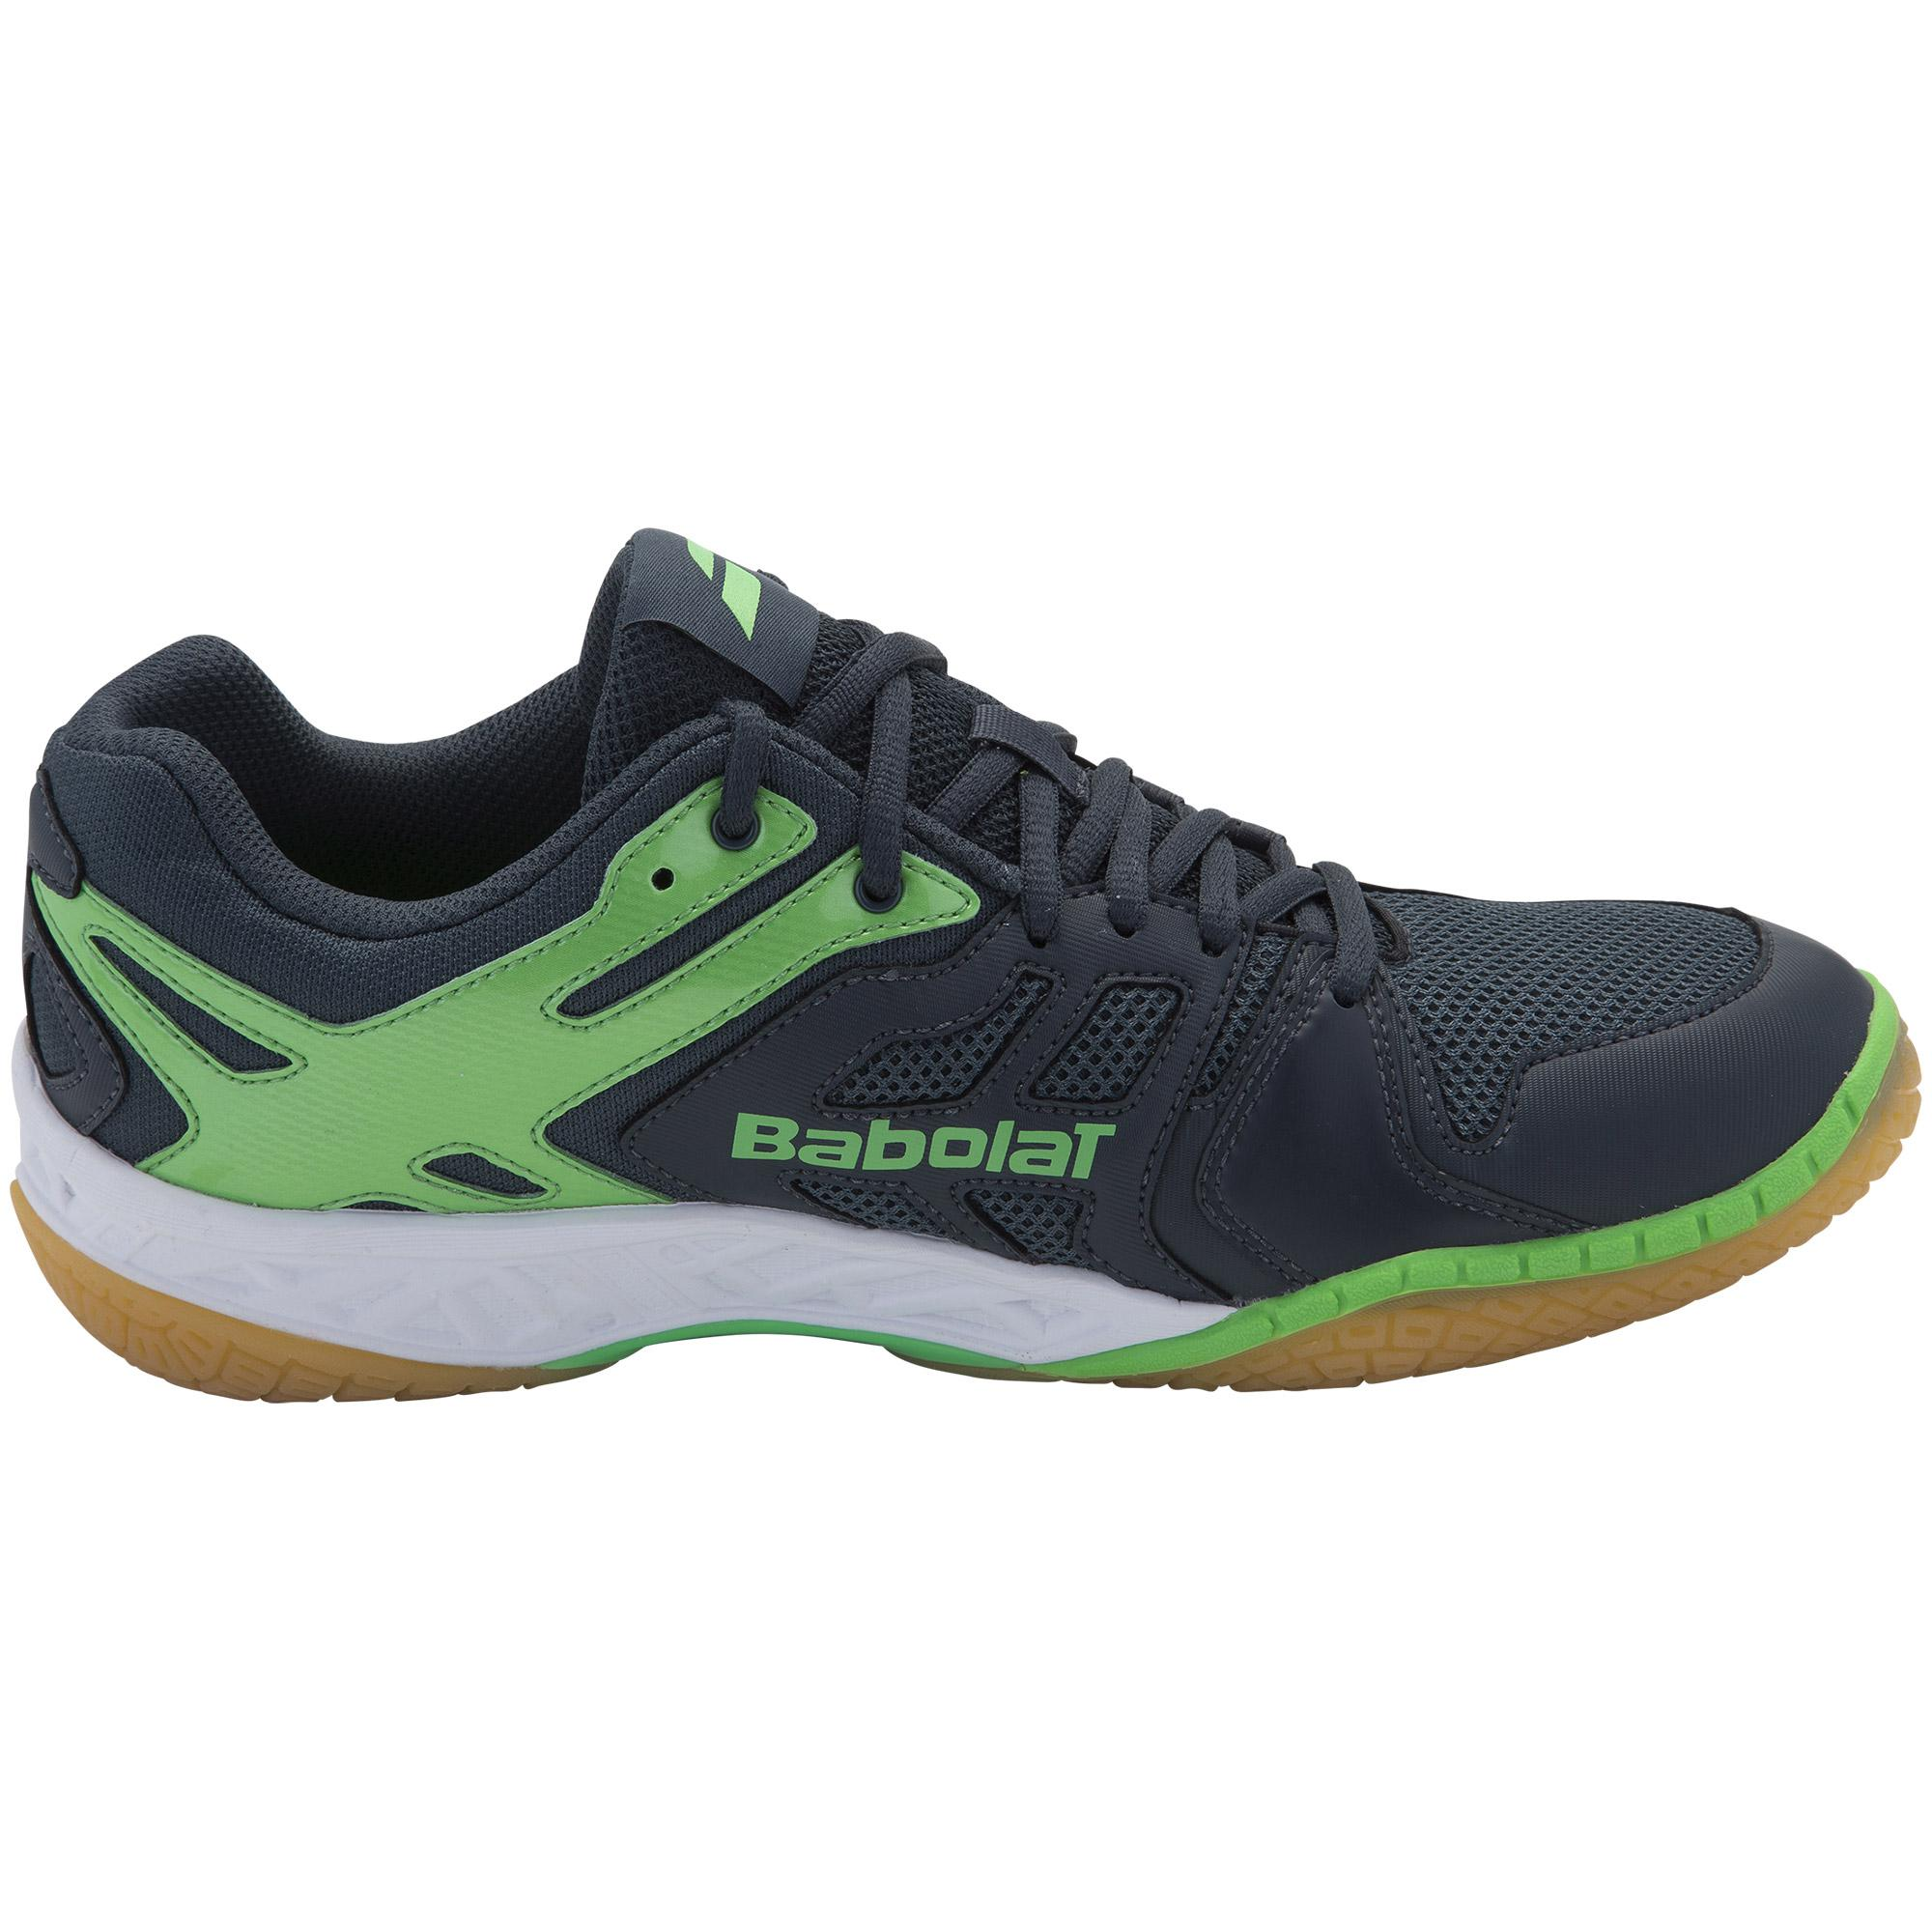 Babolat Tennis Shoes >> Babolat Mens Shadow Team Badminton Shoes - Green ...